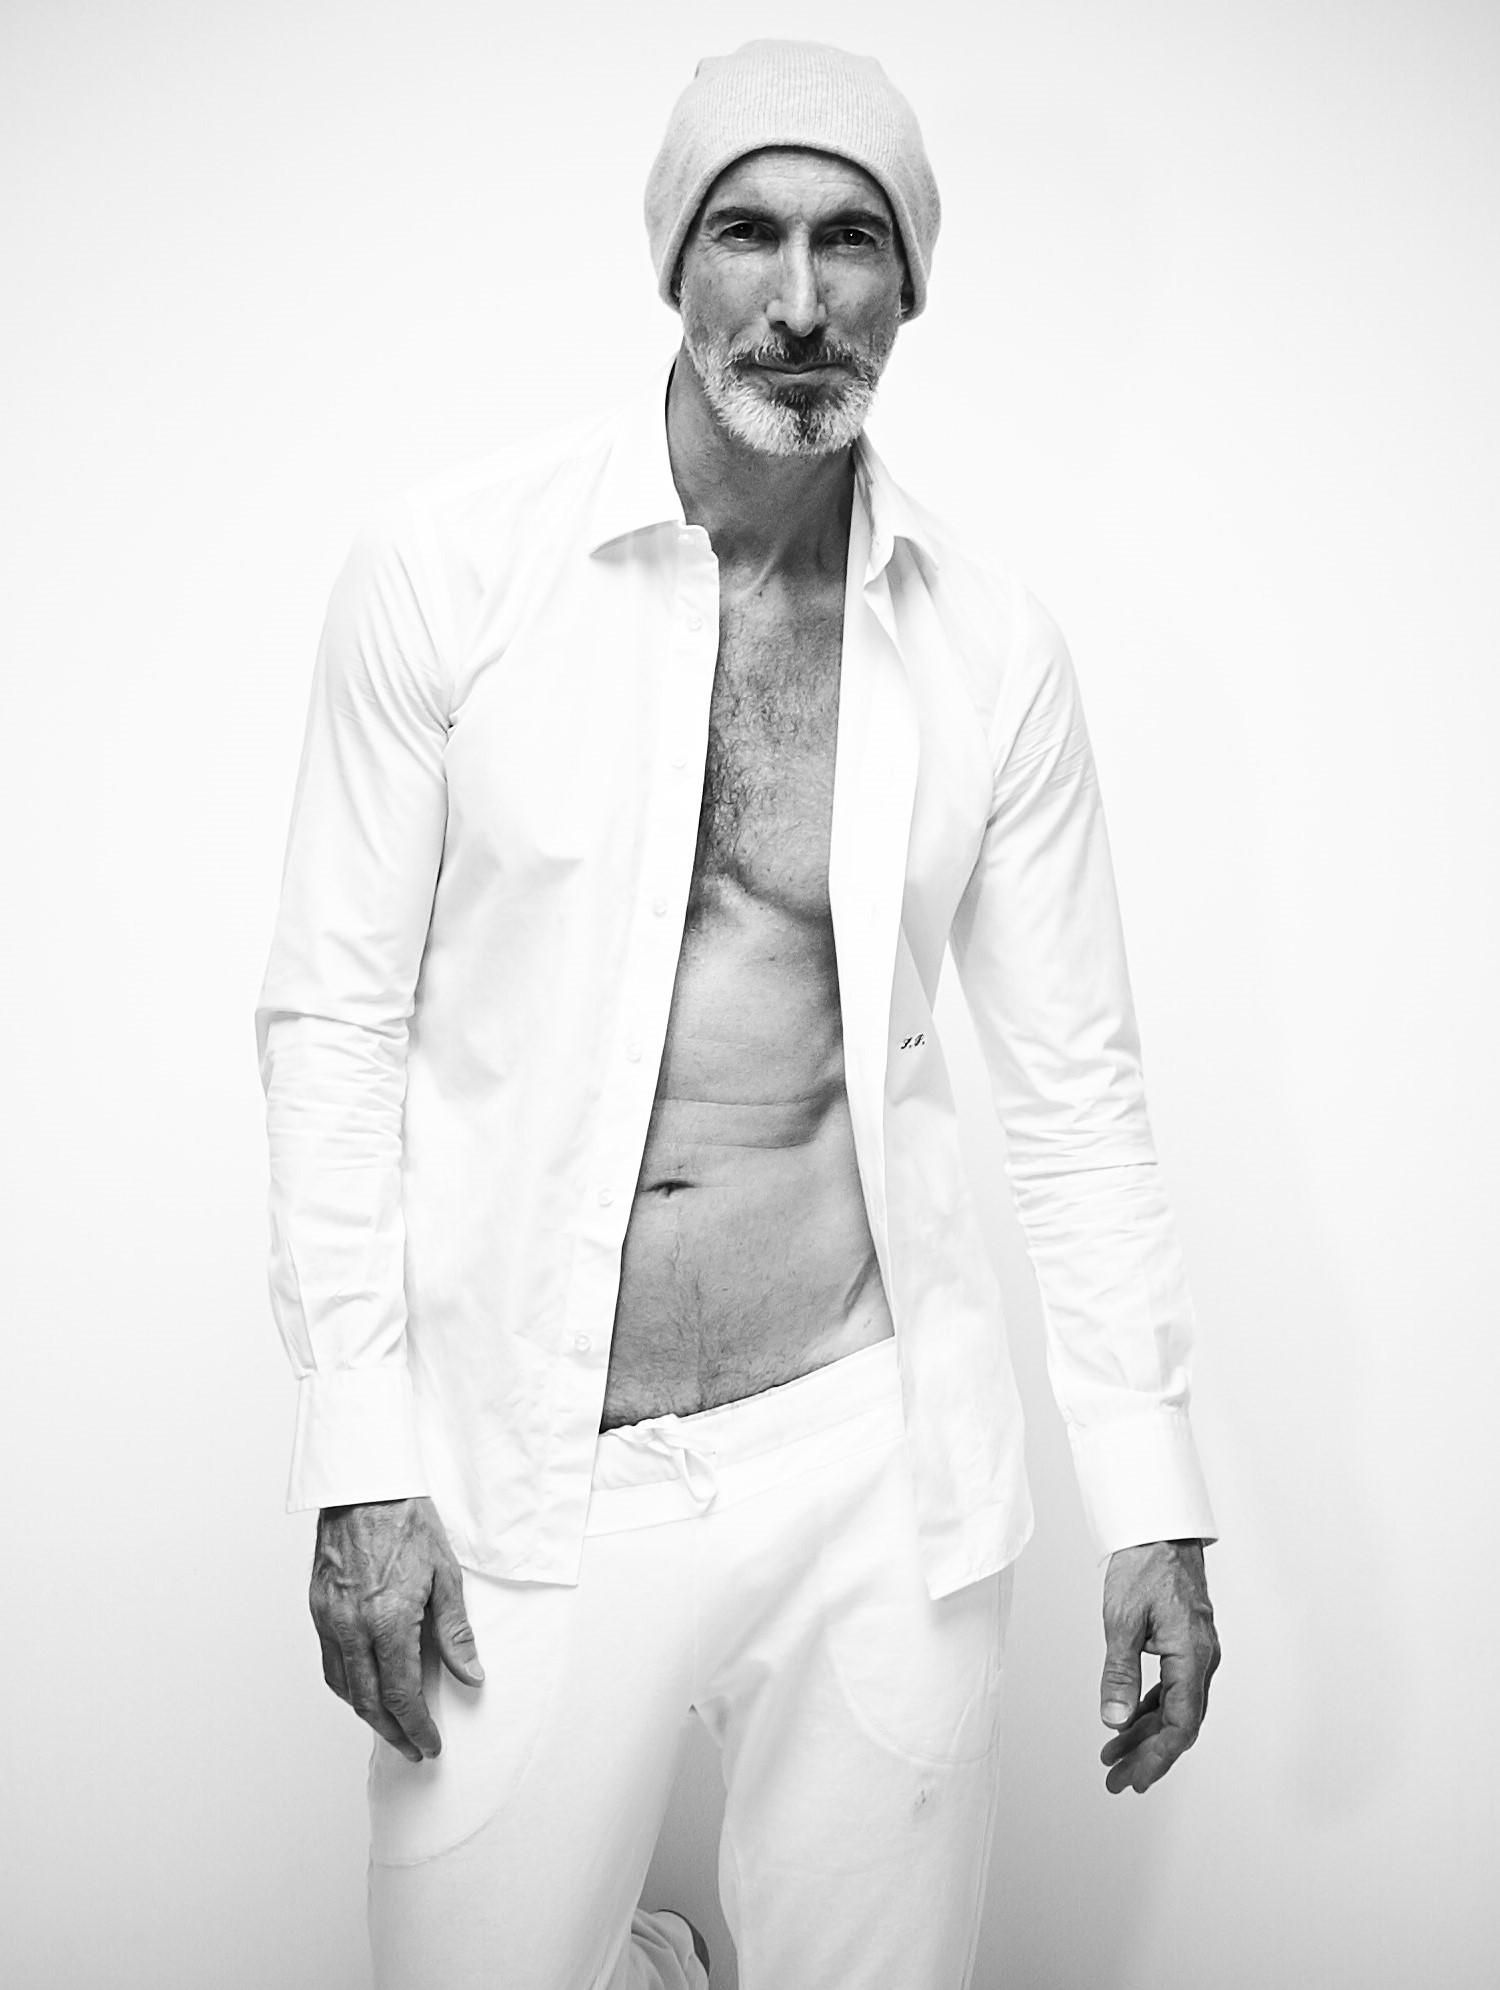 Shine-Male-Mature-Classic-Model-London-Editoral-Stefano-01-2.jpg#asset:46074